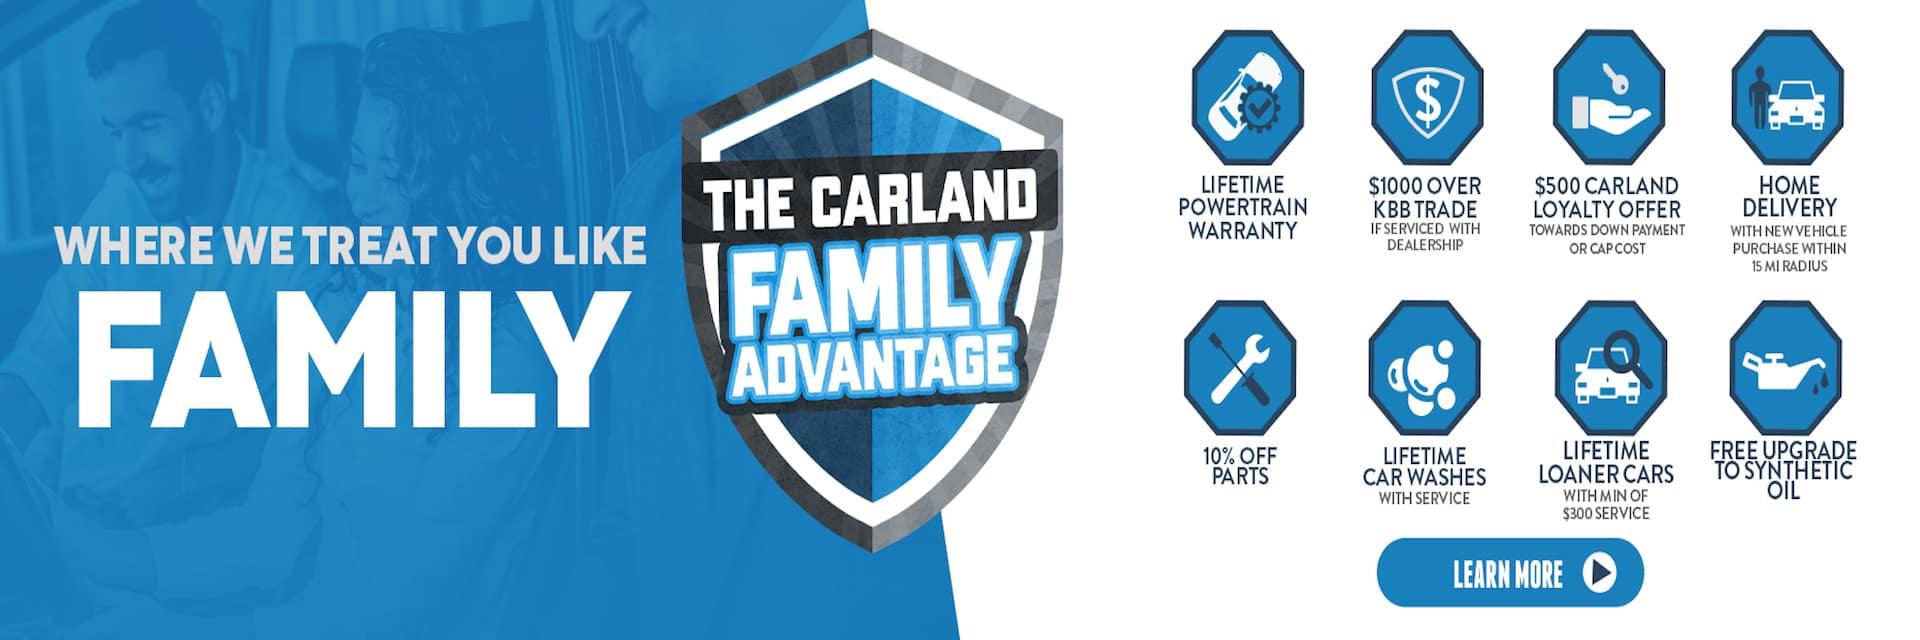 Carland Family Advantage - Duluth, GA